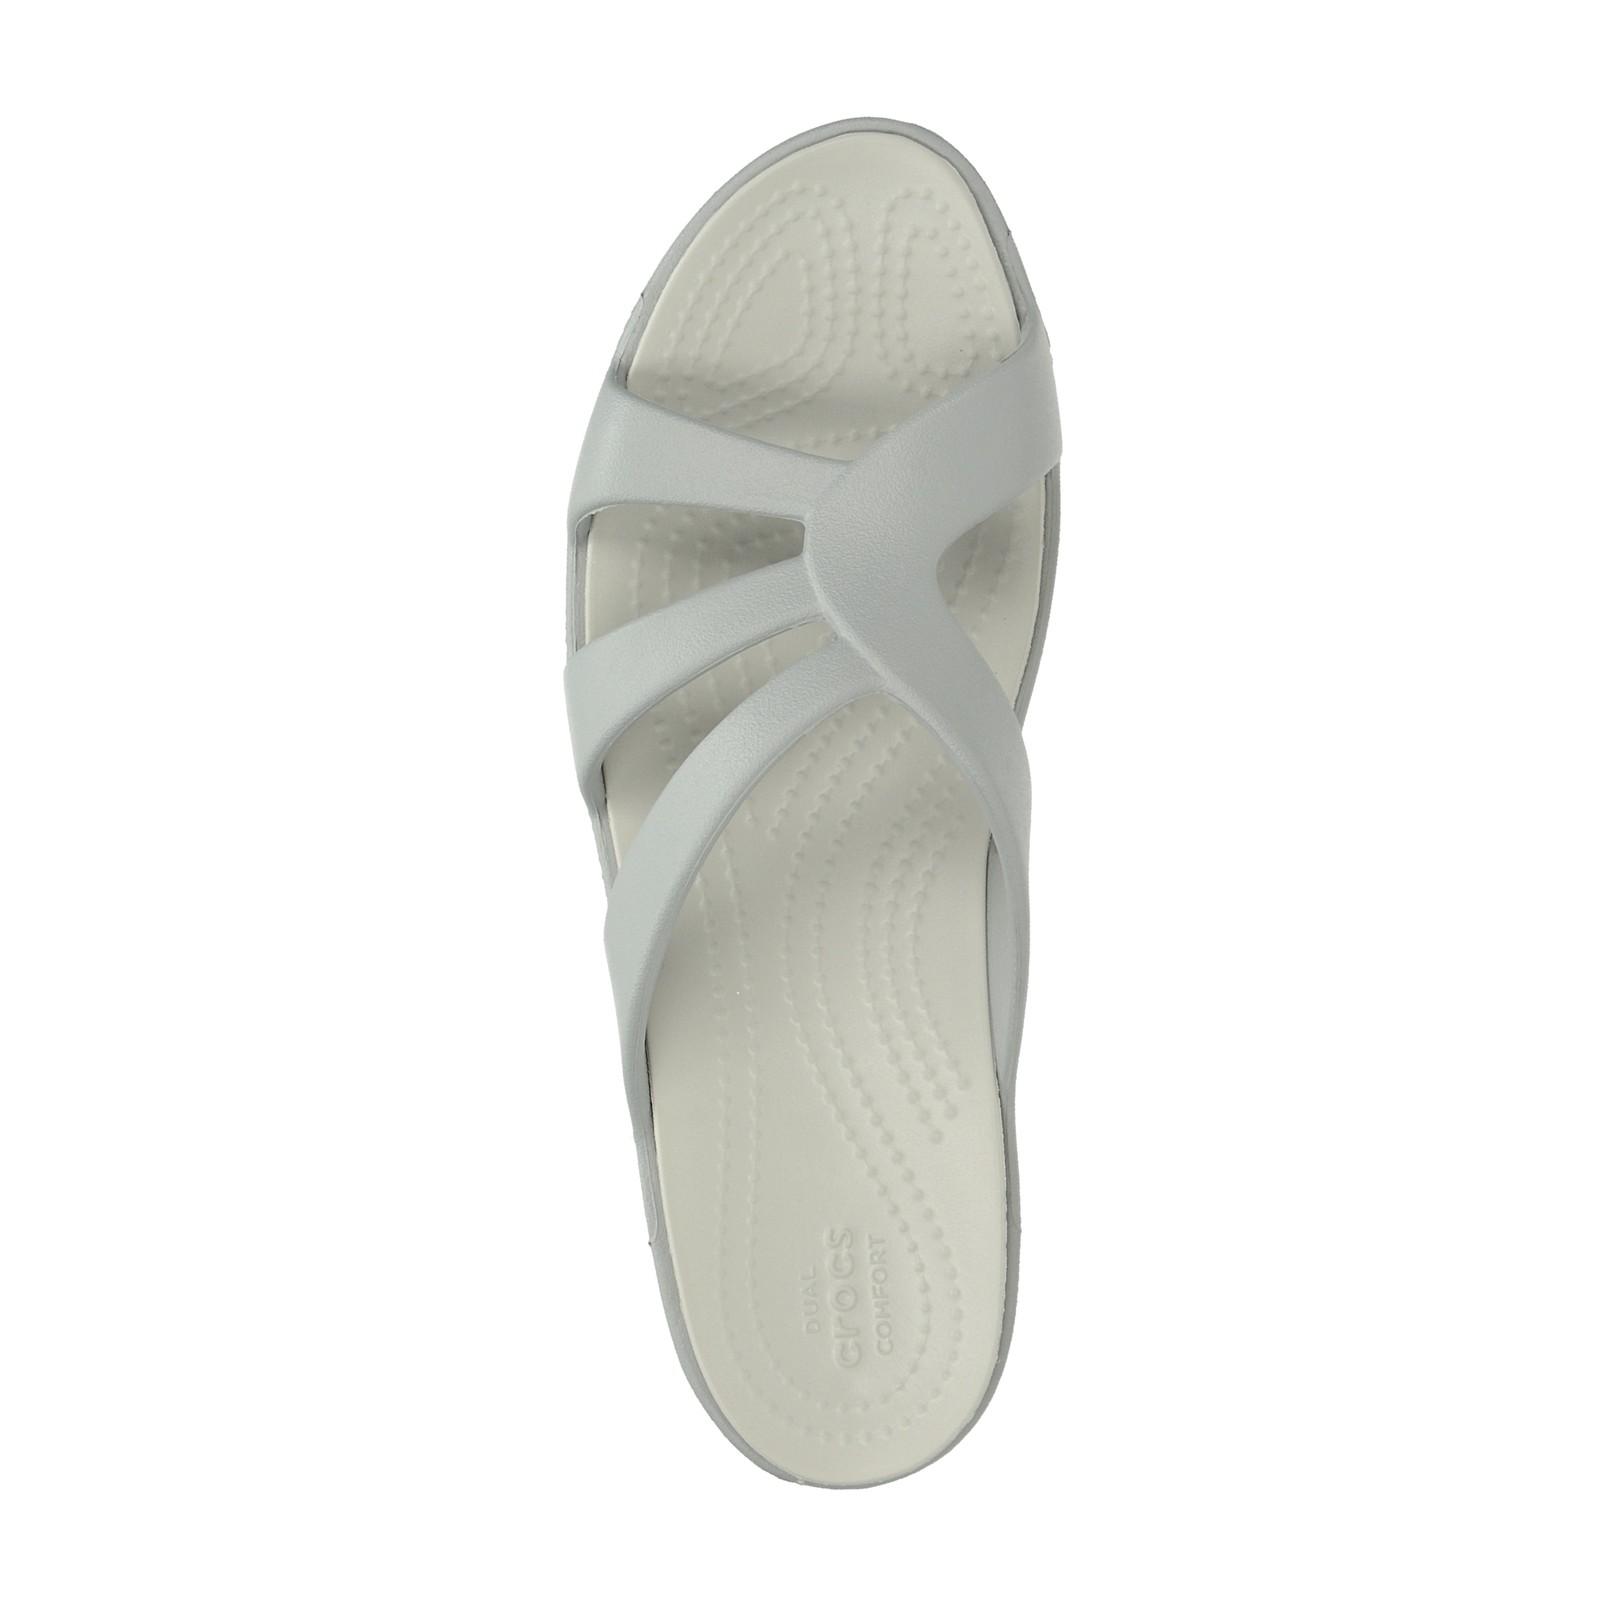 Crocs dámske pohodlné šľapky na klinovej podrážke - šedé